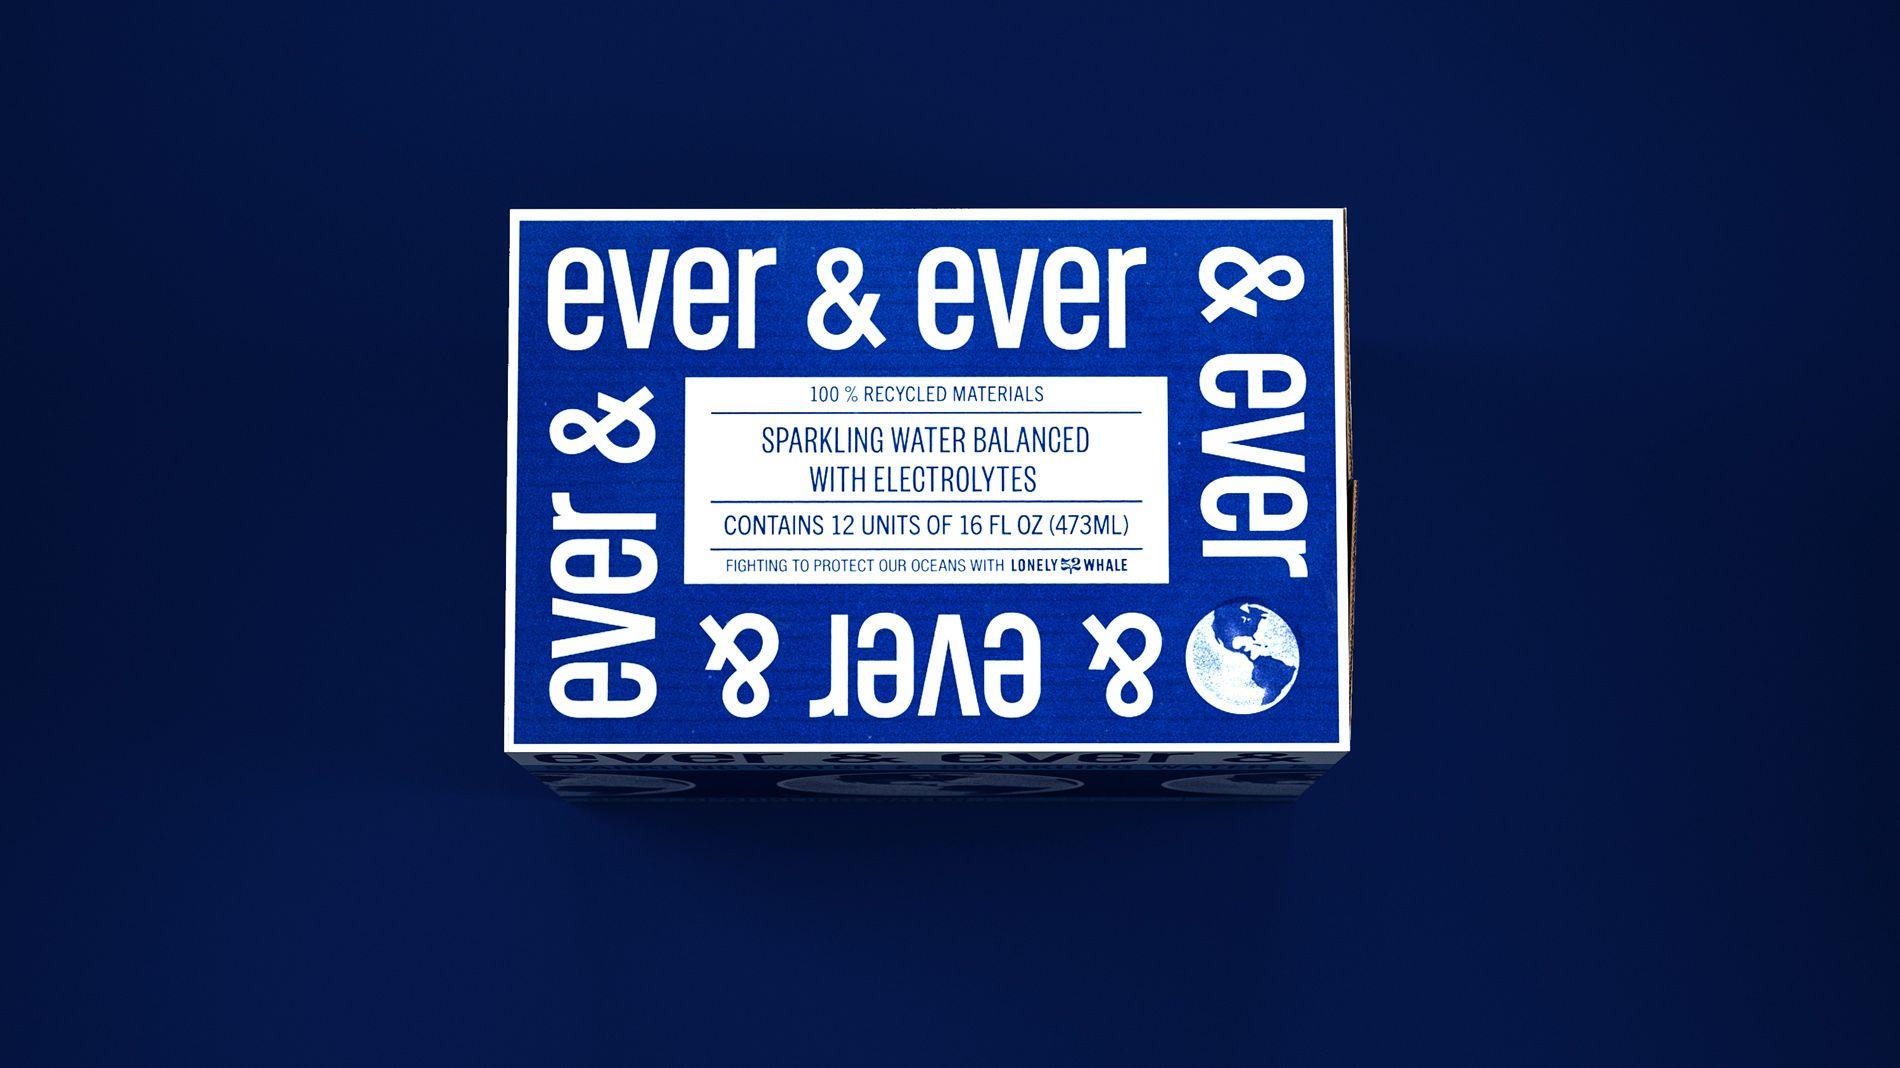 RGB.vn_ever&ever_6